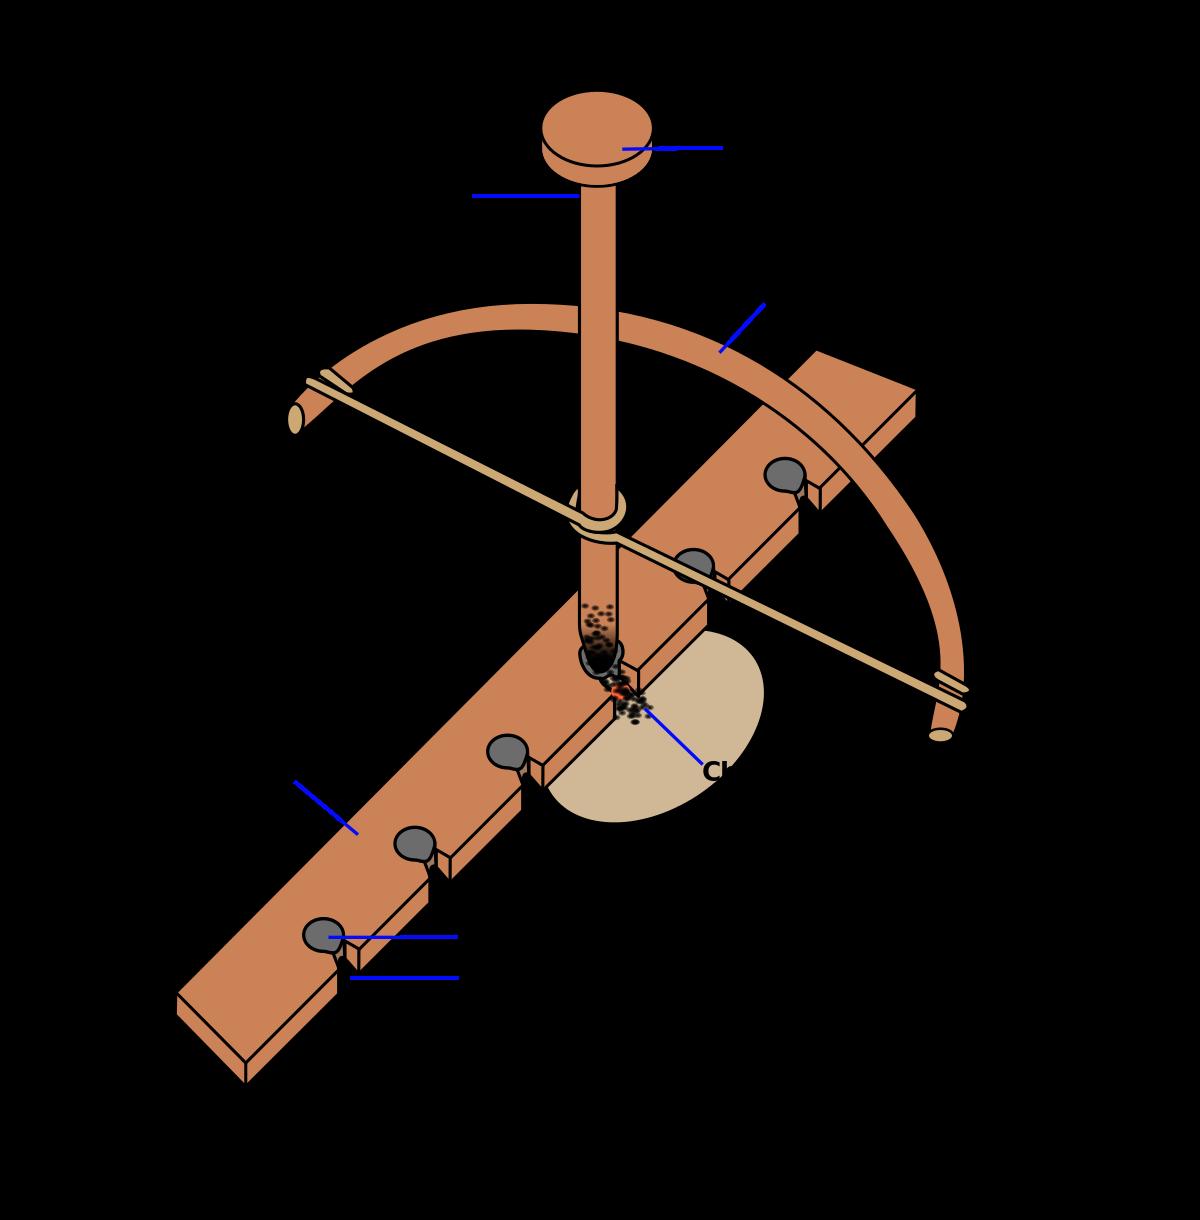 Anatomy of a lifeinharmony. Drill clipart hand drill